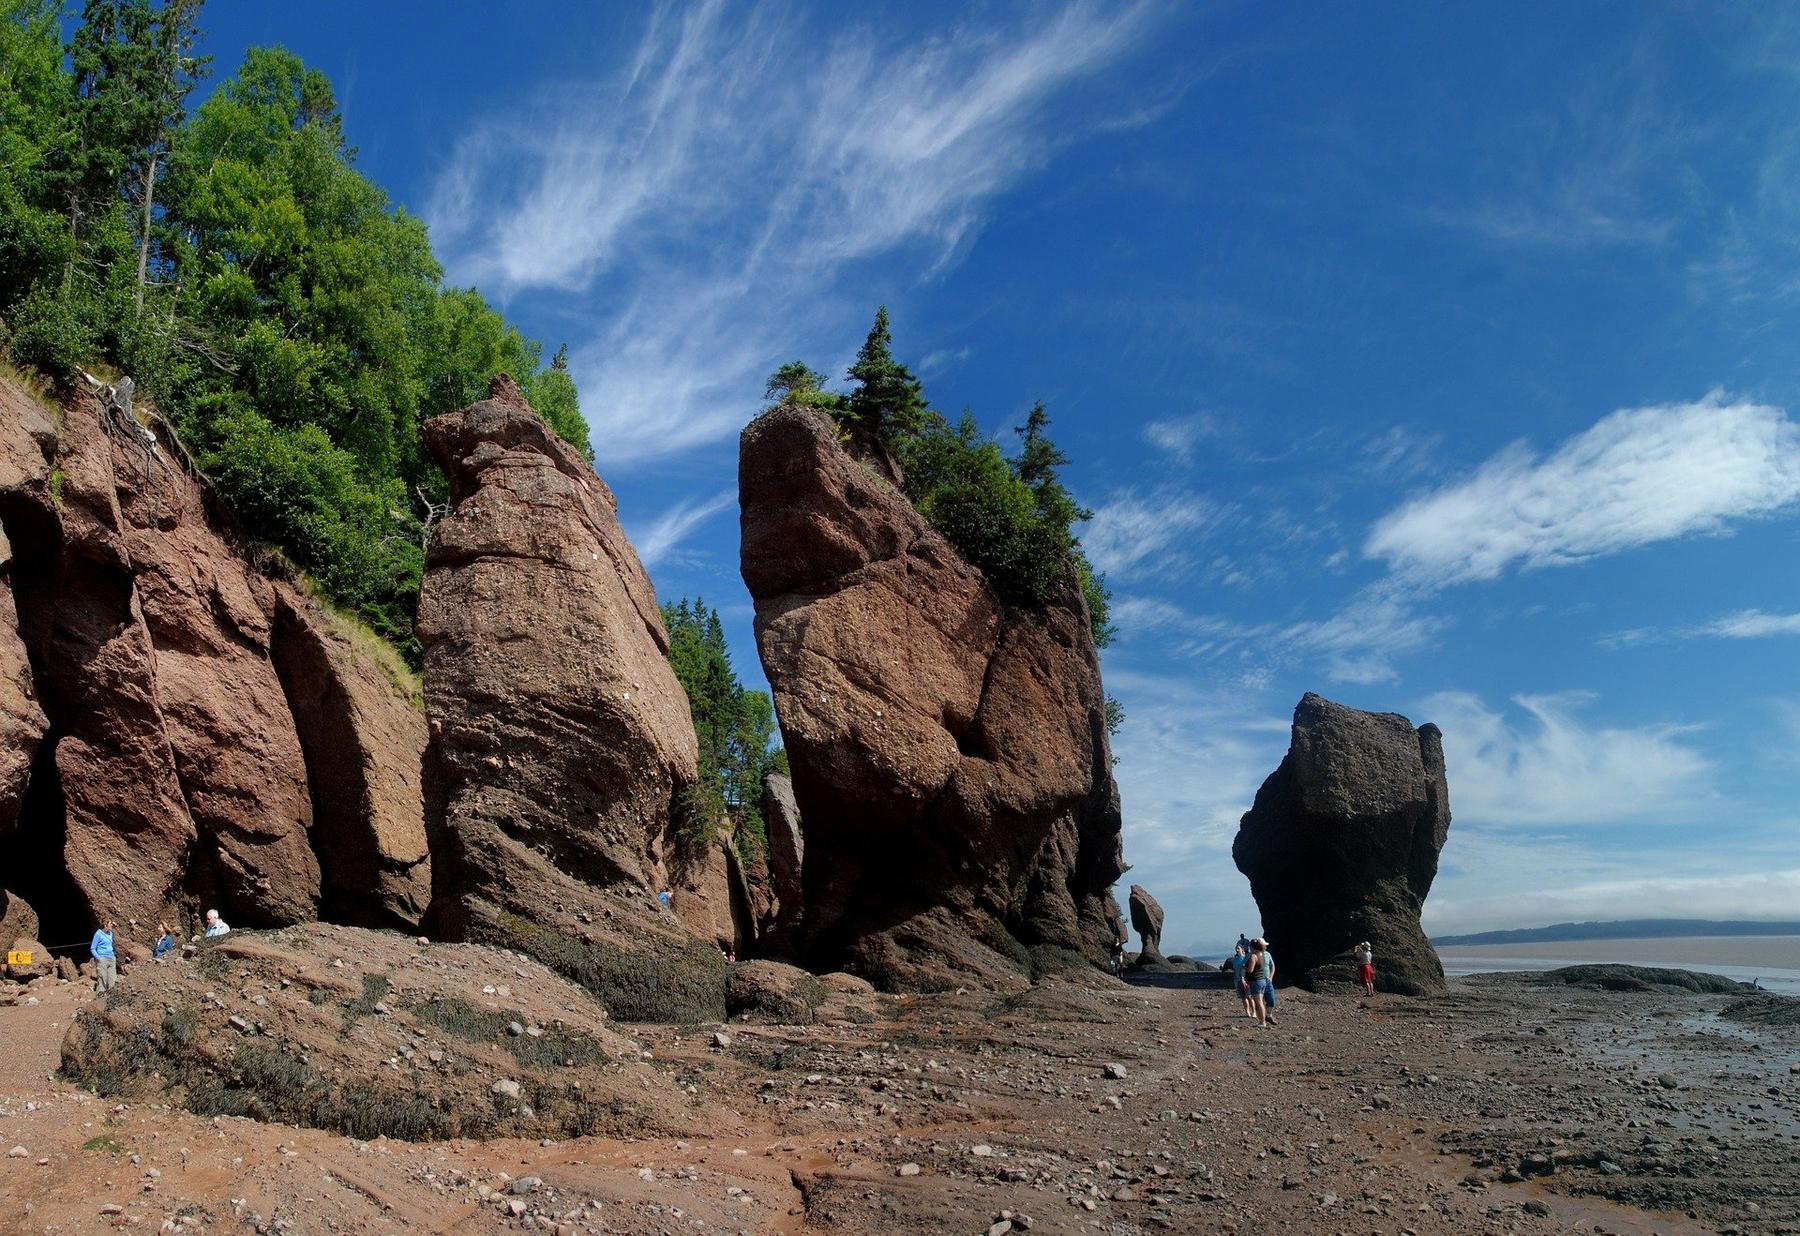 Hopewell Rocks in Bay of Fundy, New Brunswick, Canada